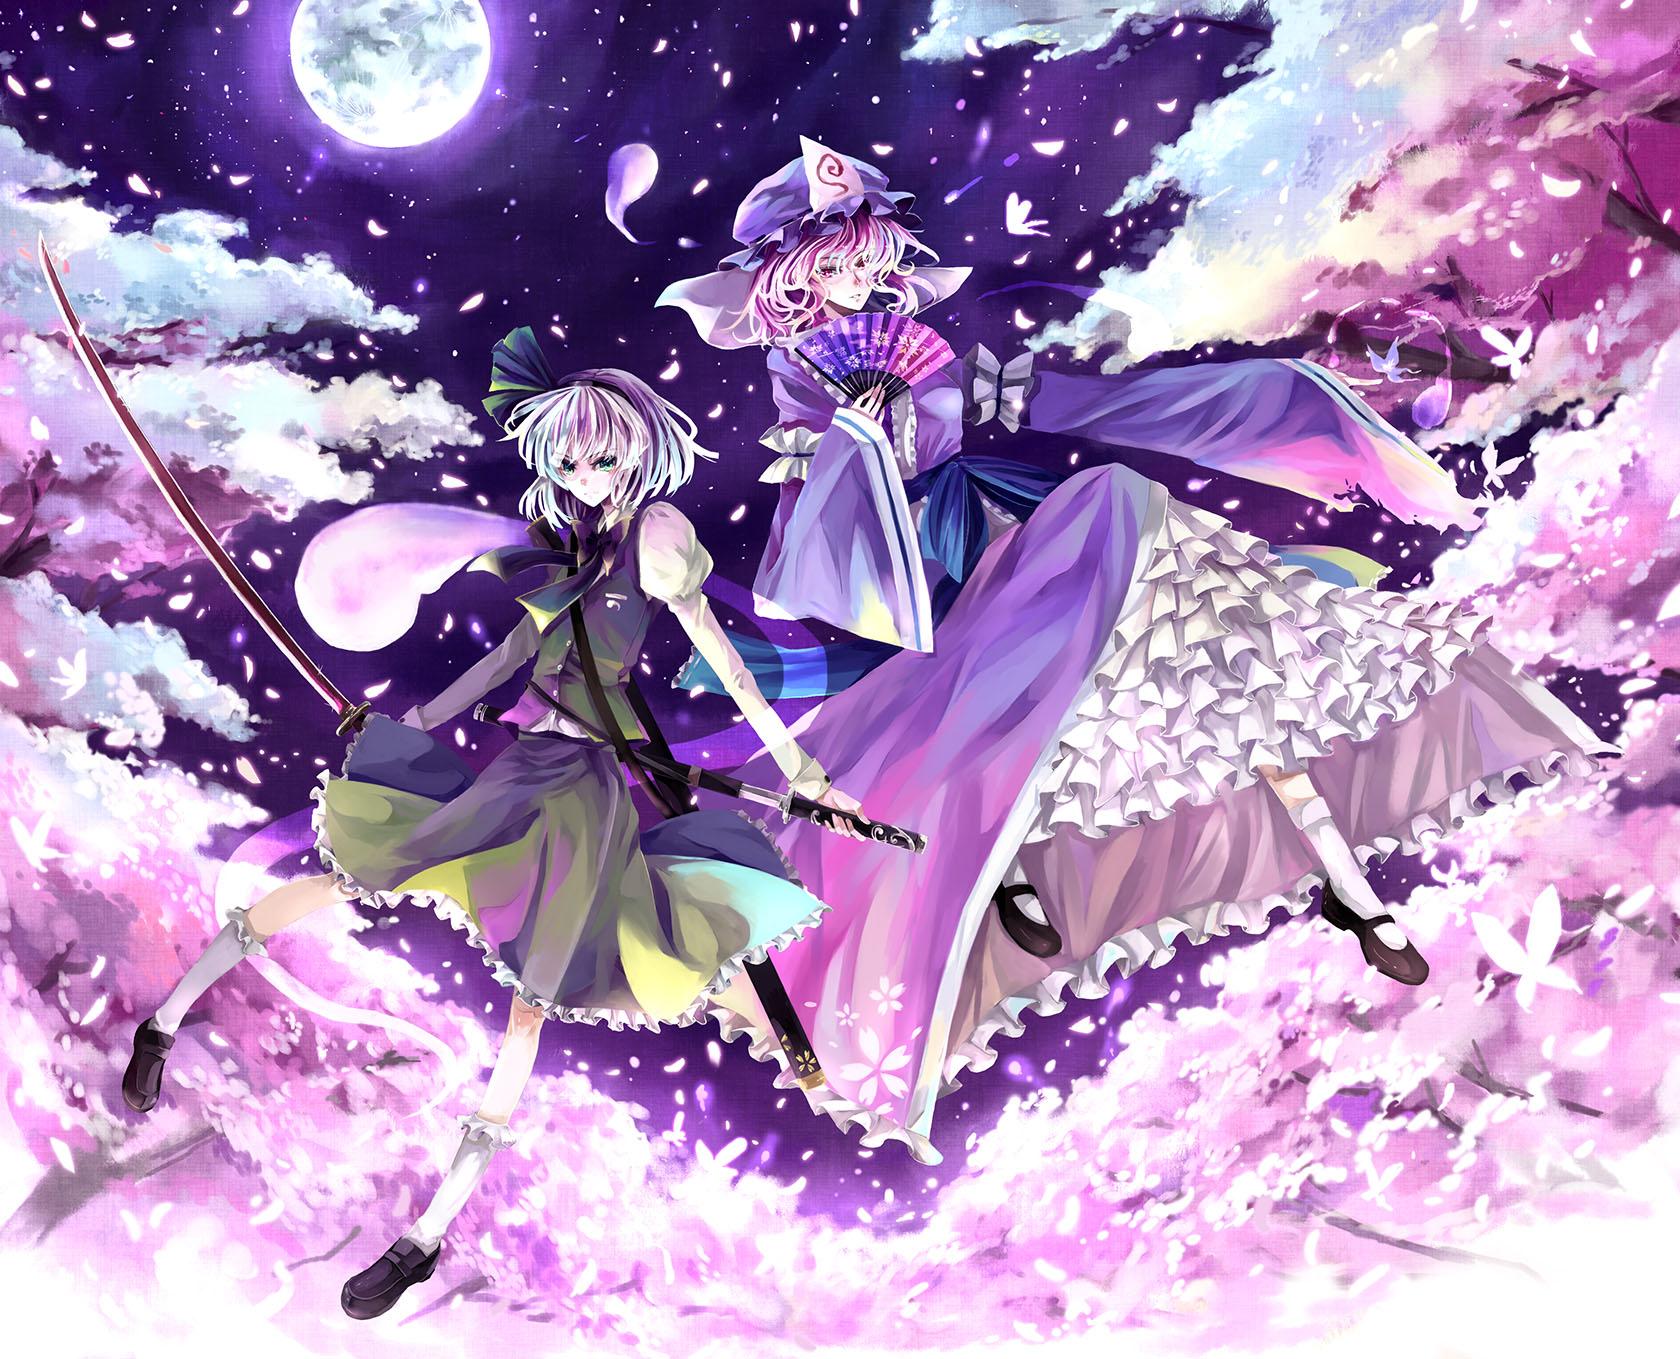 blue_eyes cherry_blossoms fan flowers hat japanese_clothes katana kimono kneehighs konpaku_youmu moon myon nako_(nonrain) petals pink_eyes pink_hair purple_hair saigyouji_yuyuko short_hair skirt sky sword touhou weapon white_hair